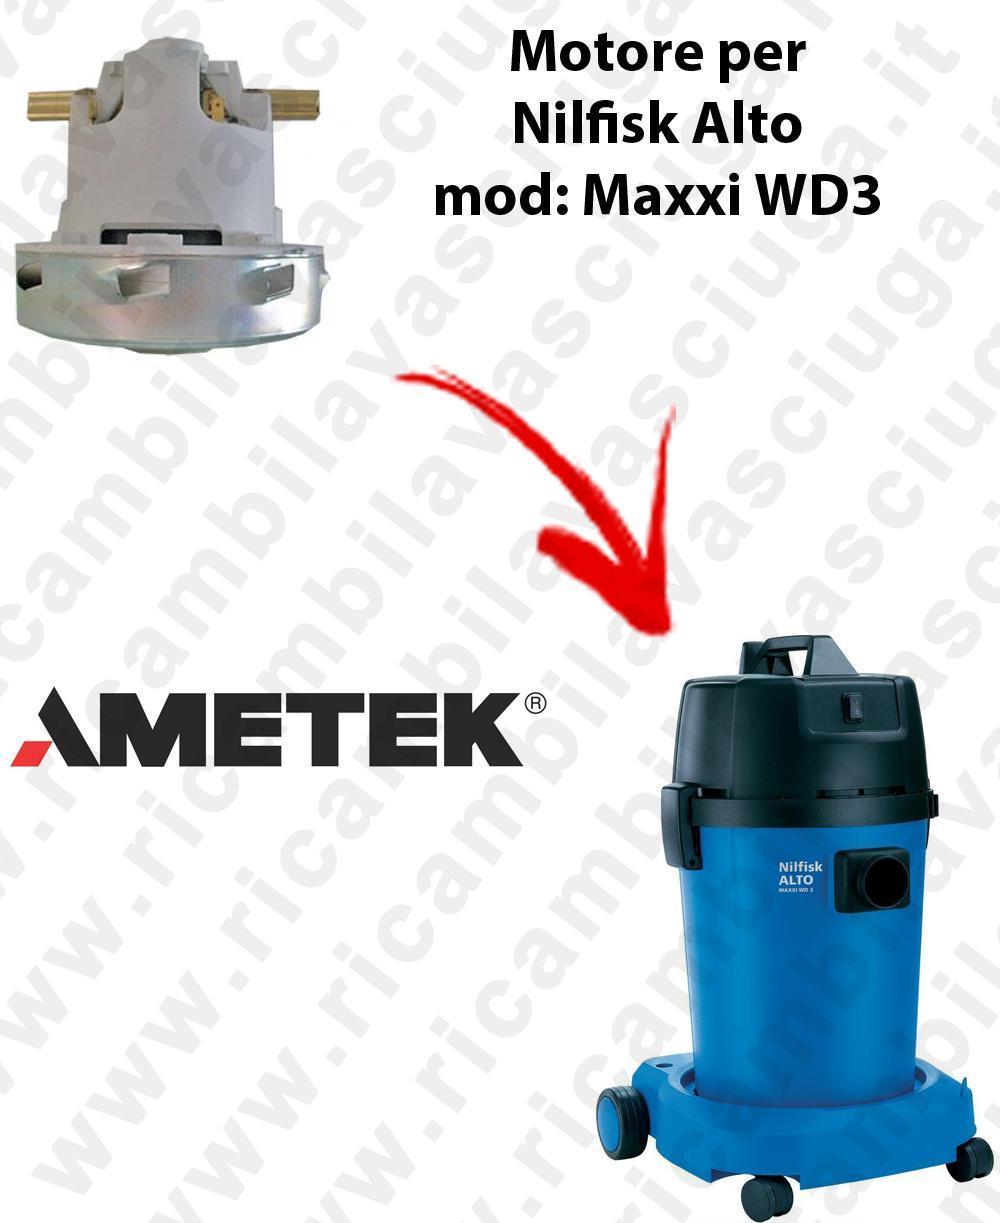 MAXXI WD3 Saugmotor AMETEK für Staubsauger NILFISK ALTO